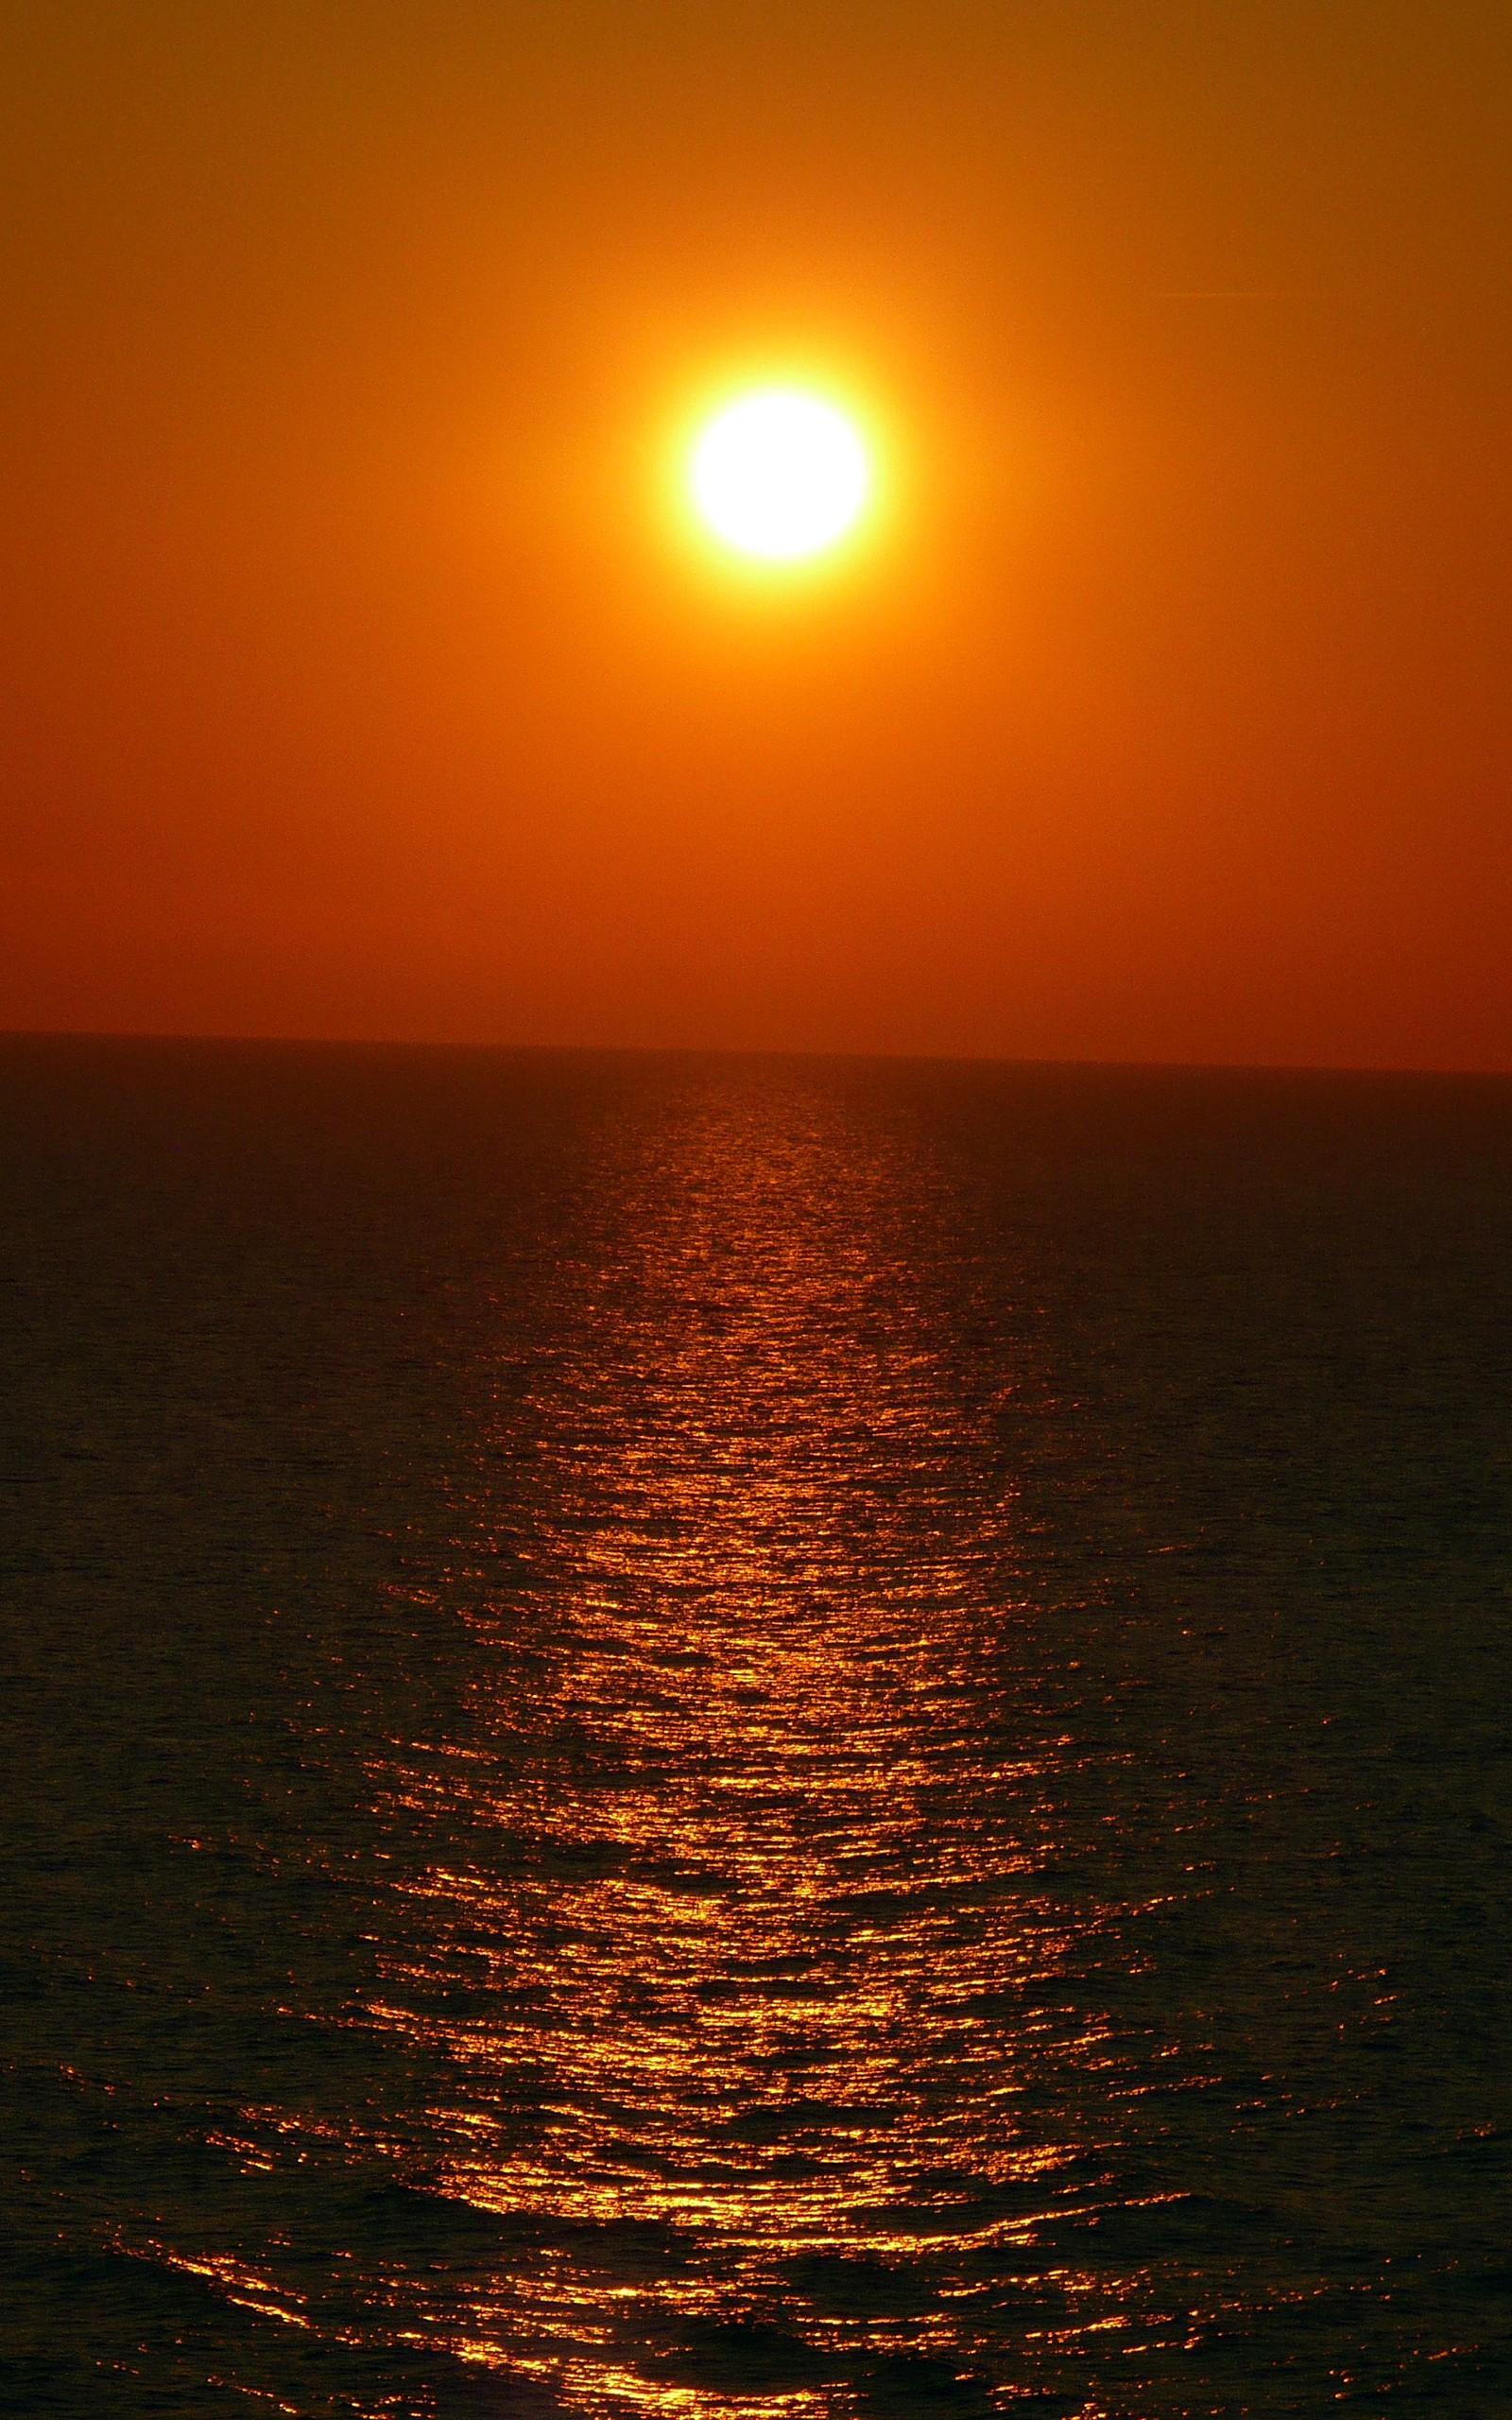 Wallpaper sunlight sunset sea water shore portrait for 1600x2560 wallpaper hd